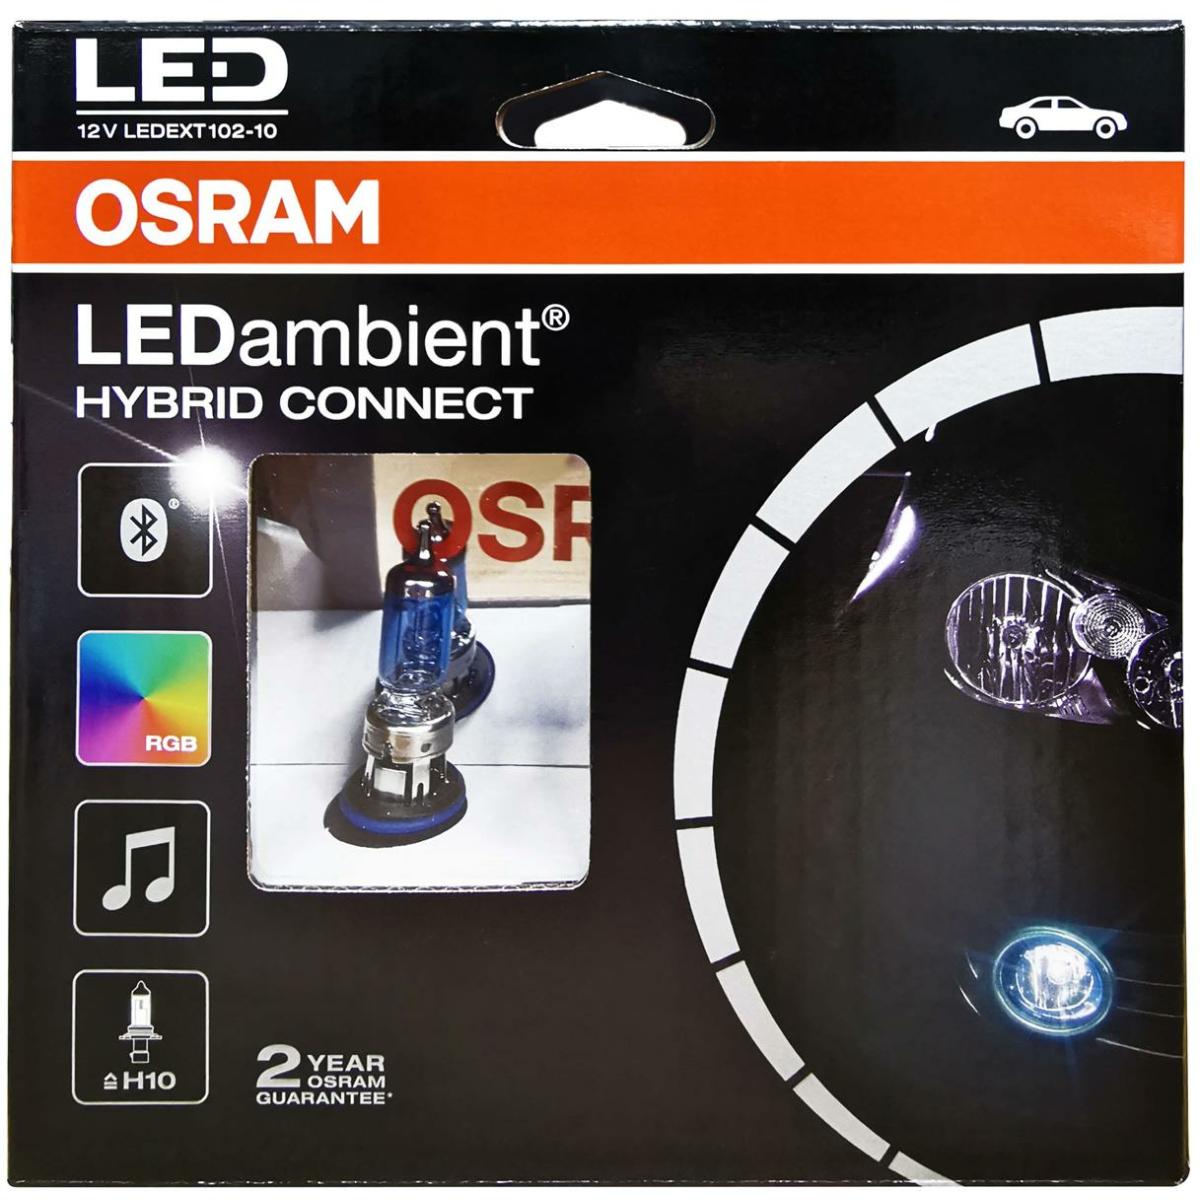 Osram LEDEXT102-10 LEDambient Styling Lights, 1 set